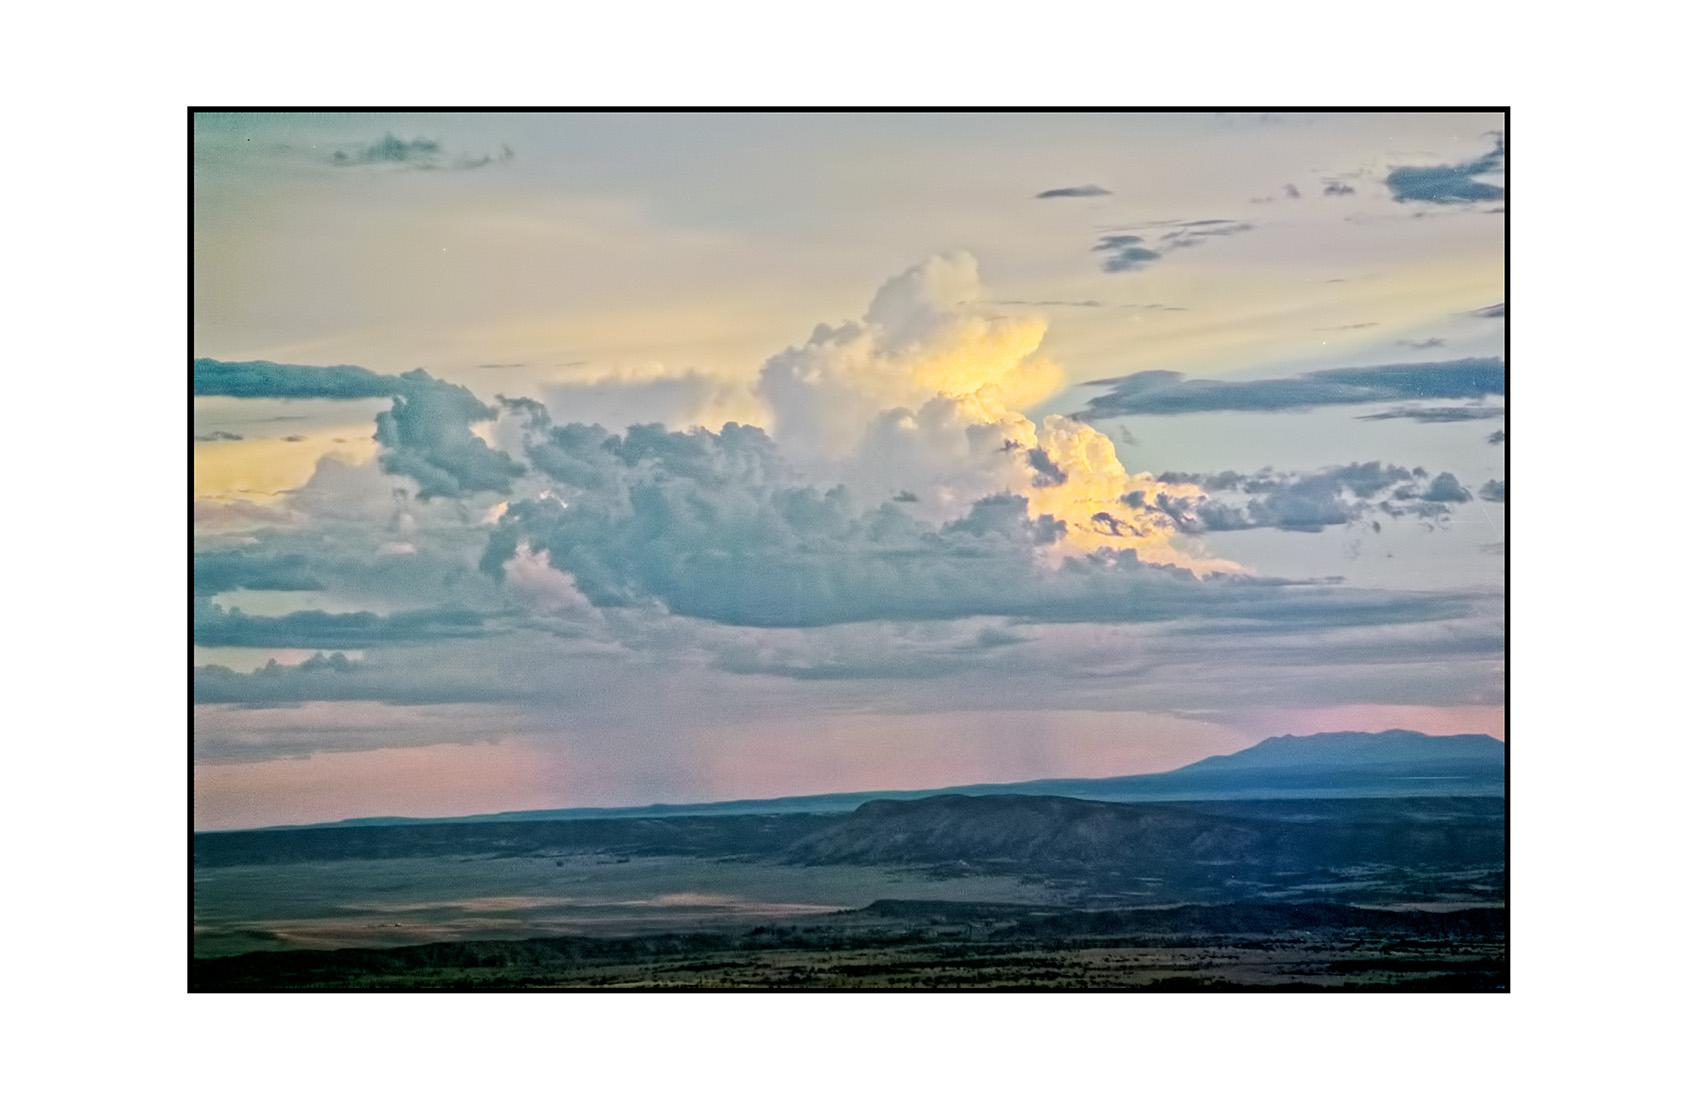 Sunset. Galisteo Basin, NM